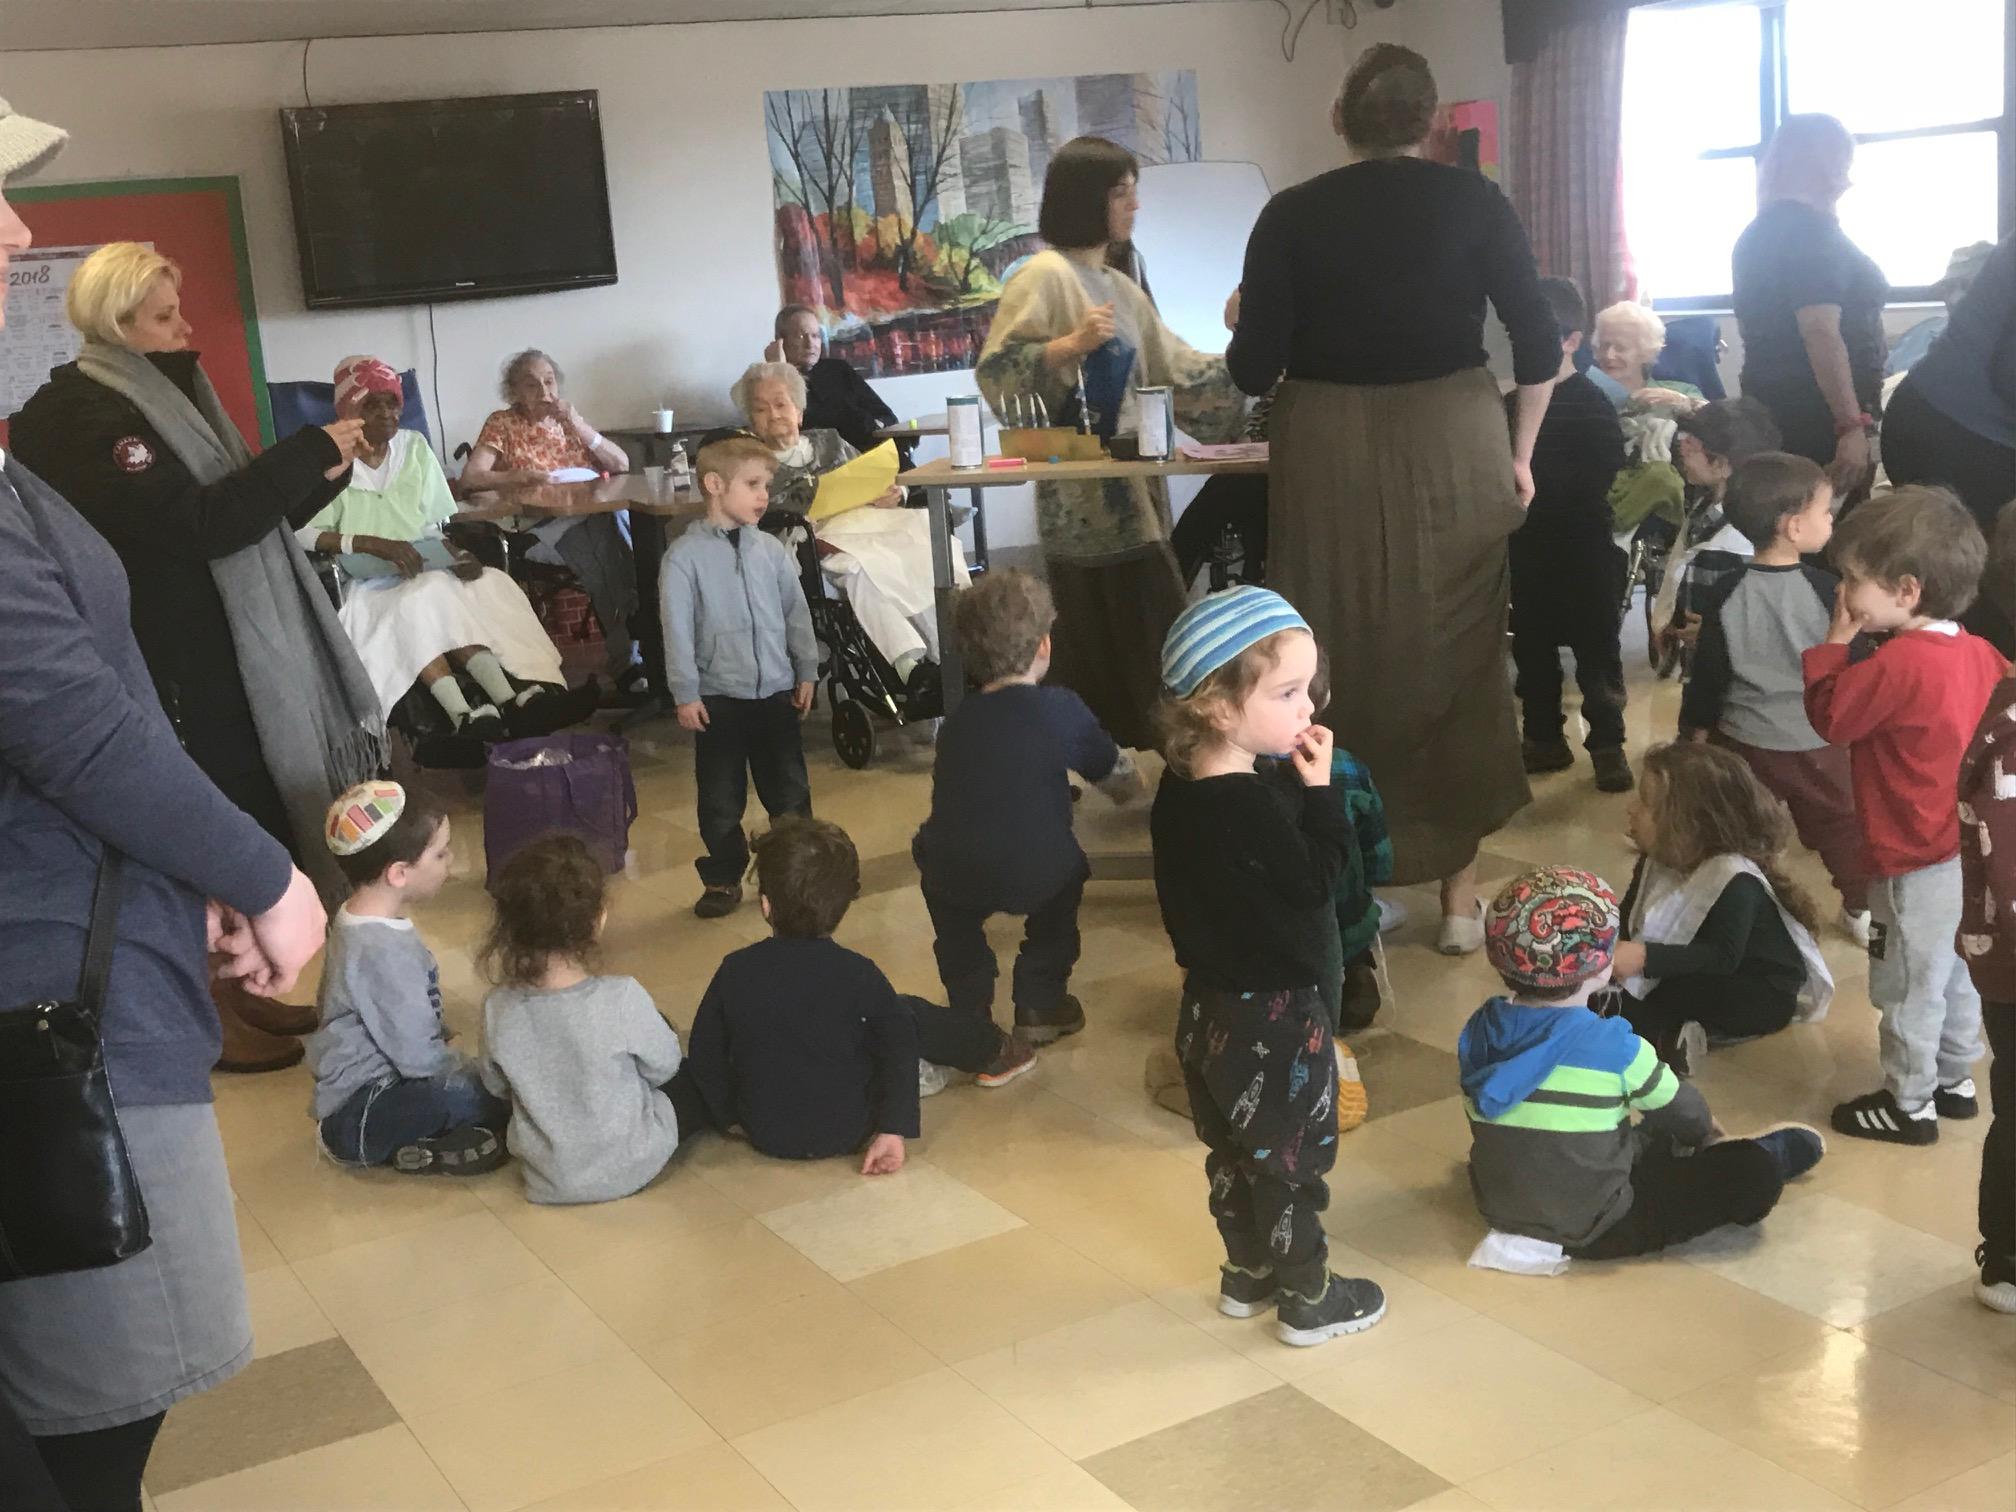 Celebrating Hanukkah at Fort Tryon